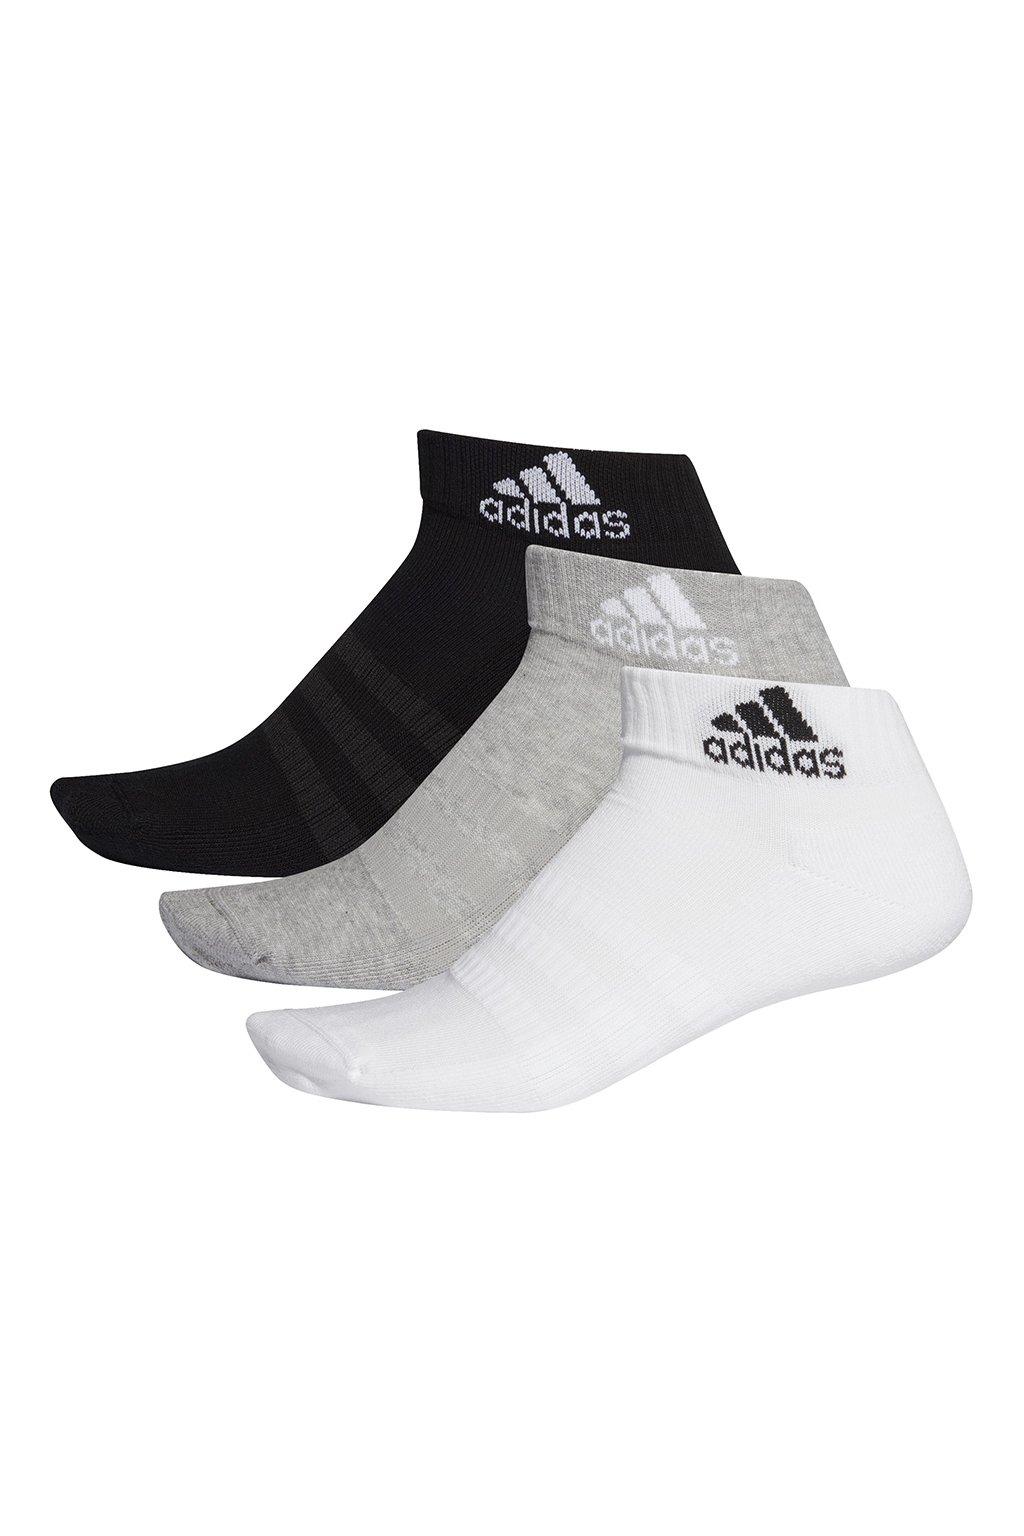 Ponožky Adidas Cushlined Ankle 3PP biele, čierne, sivé DZ9364